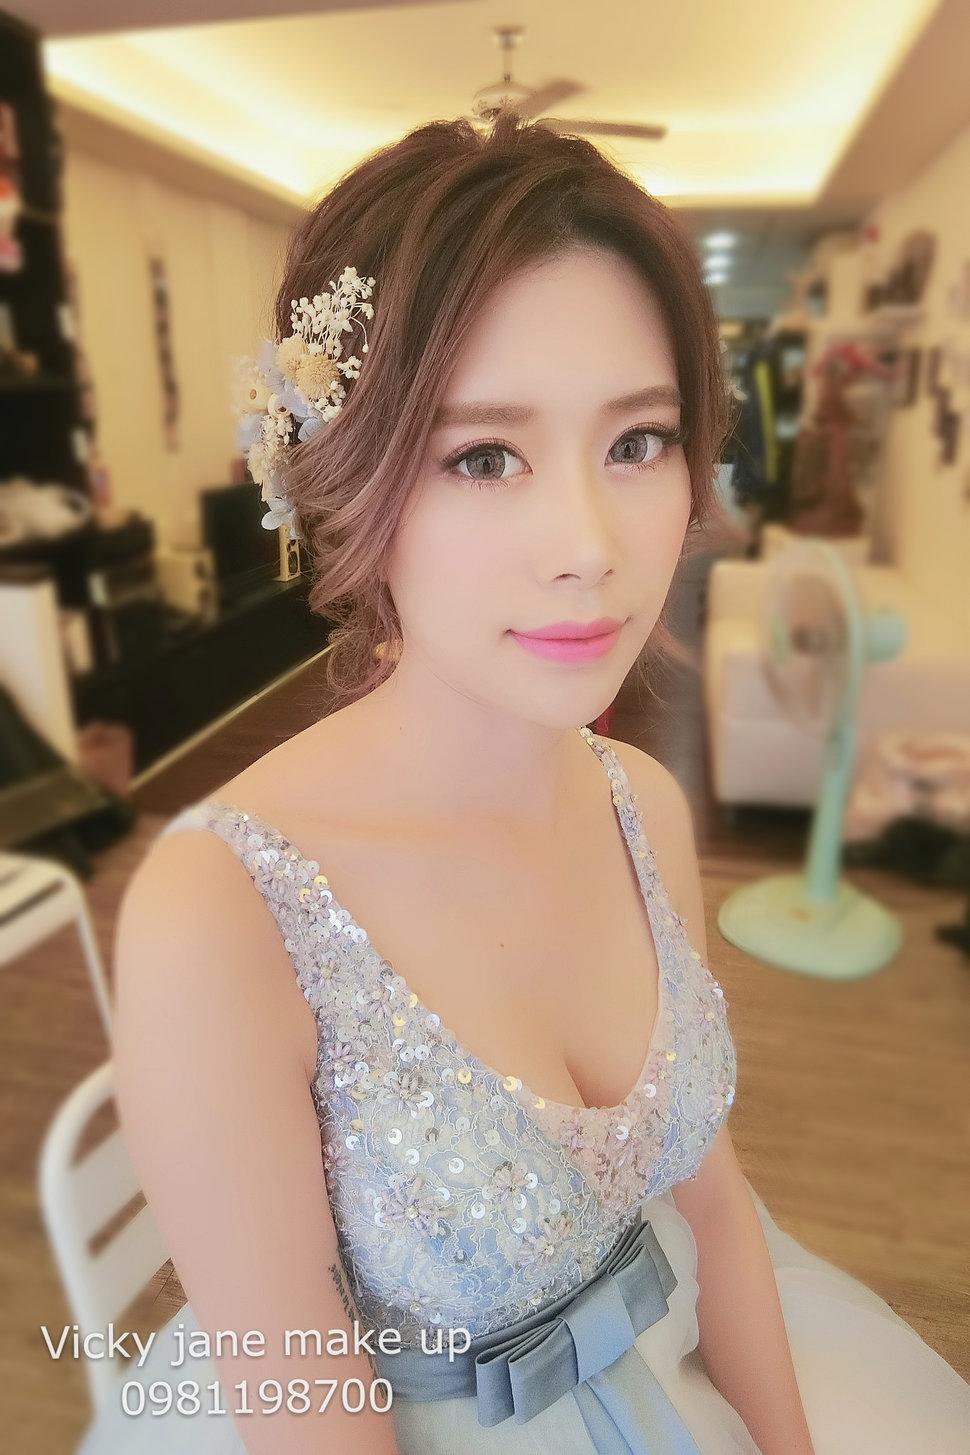 IMG_9900 - Vicky Jane makeup《結婚吧》